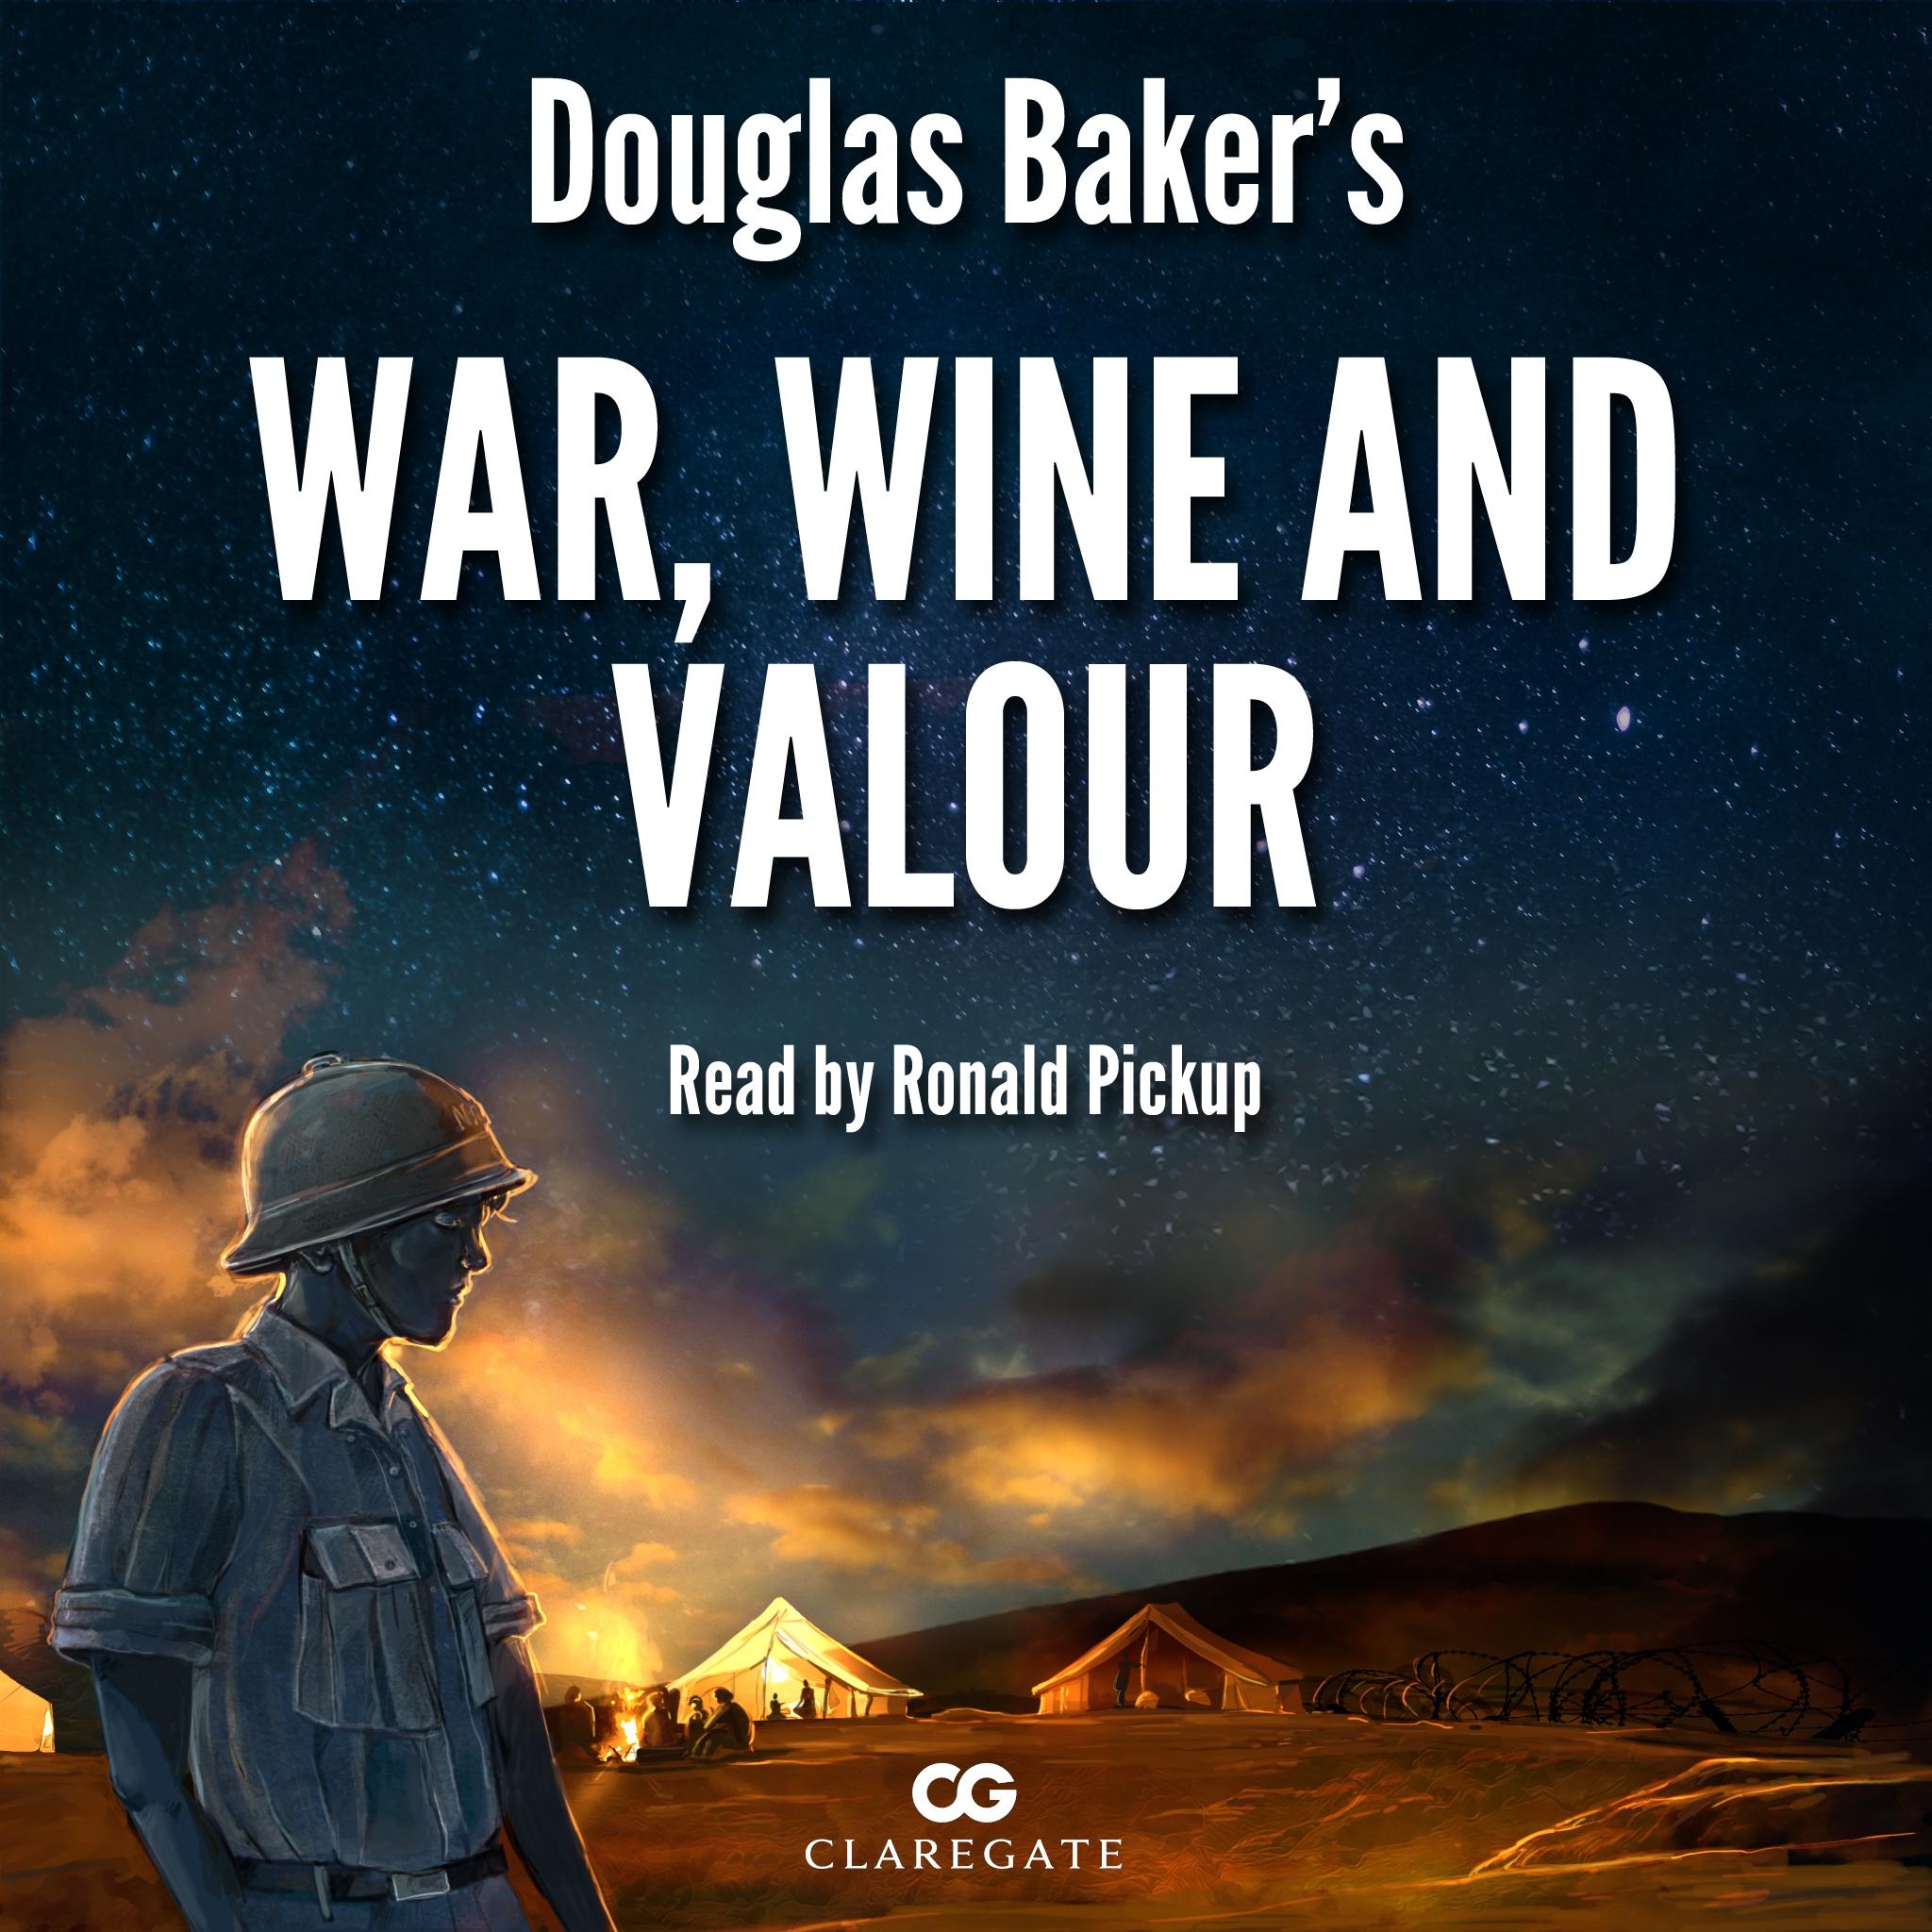 War, Wine and Valour audio book